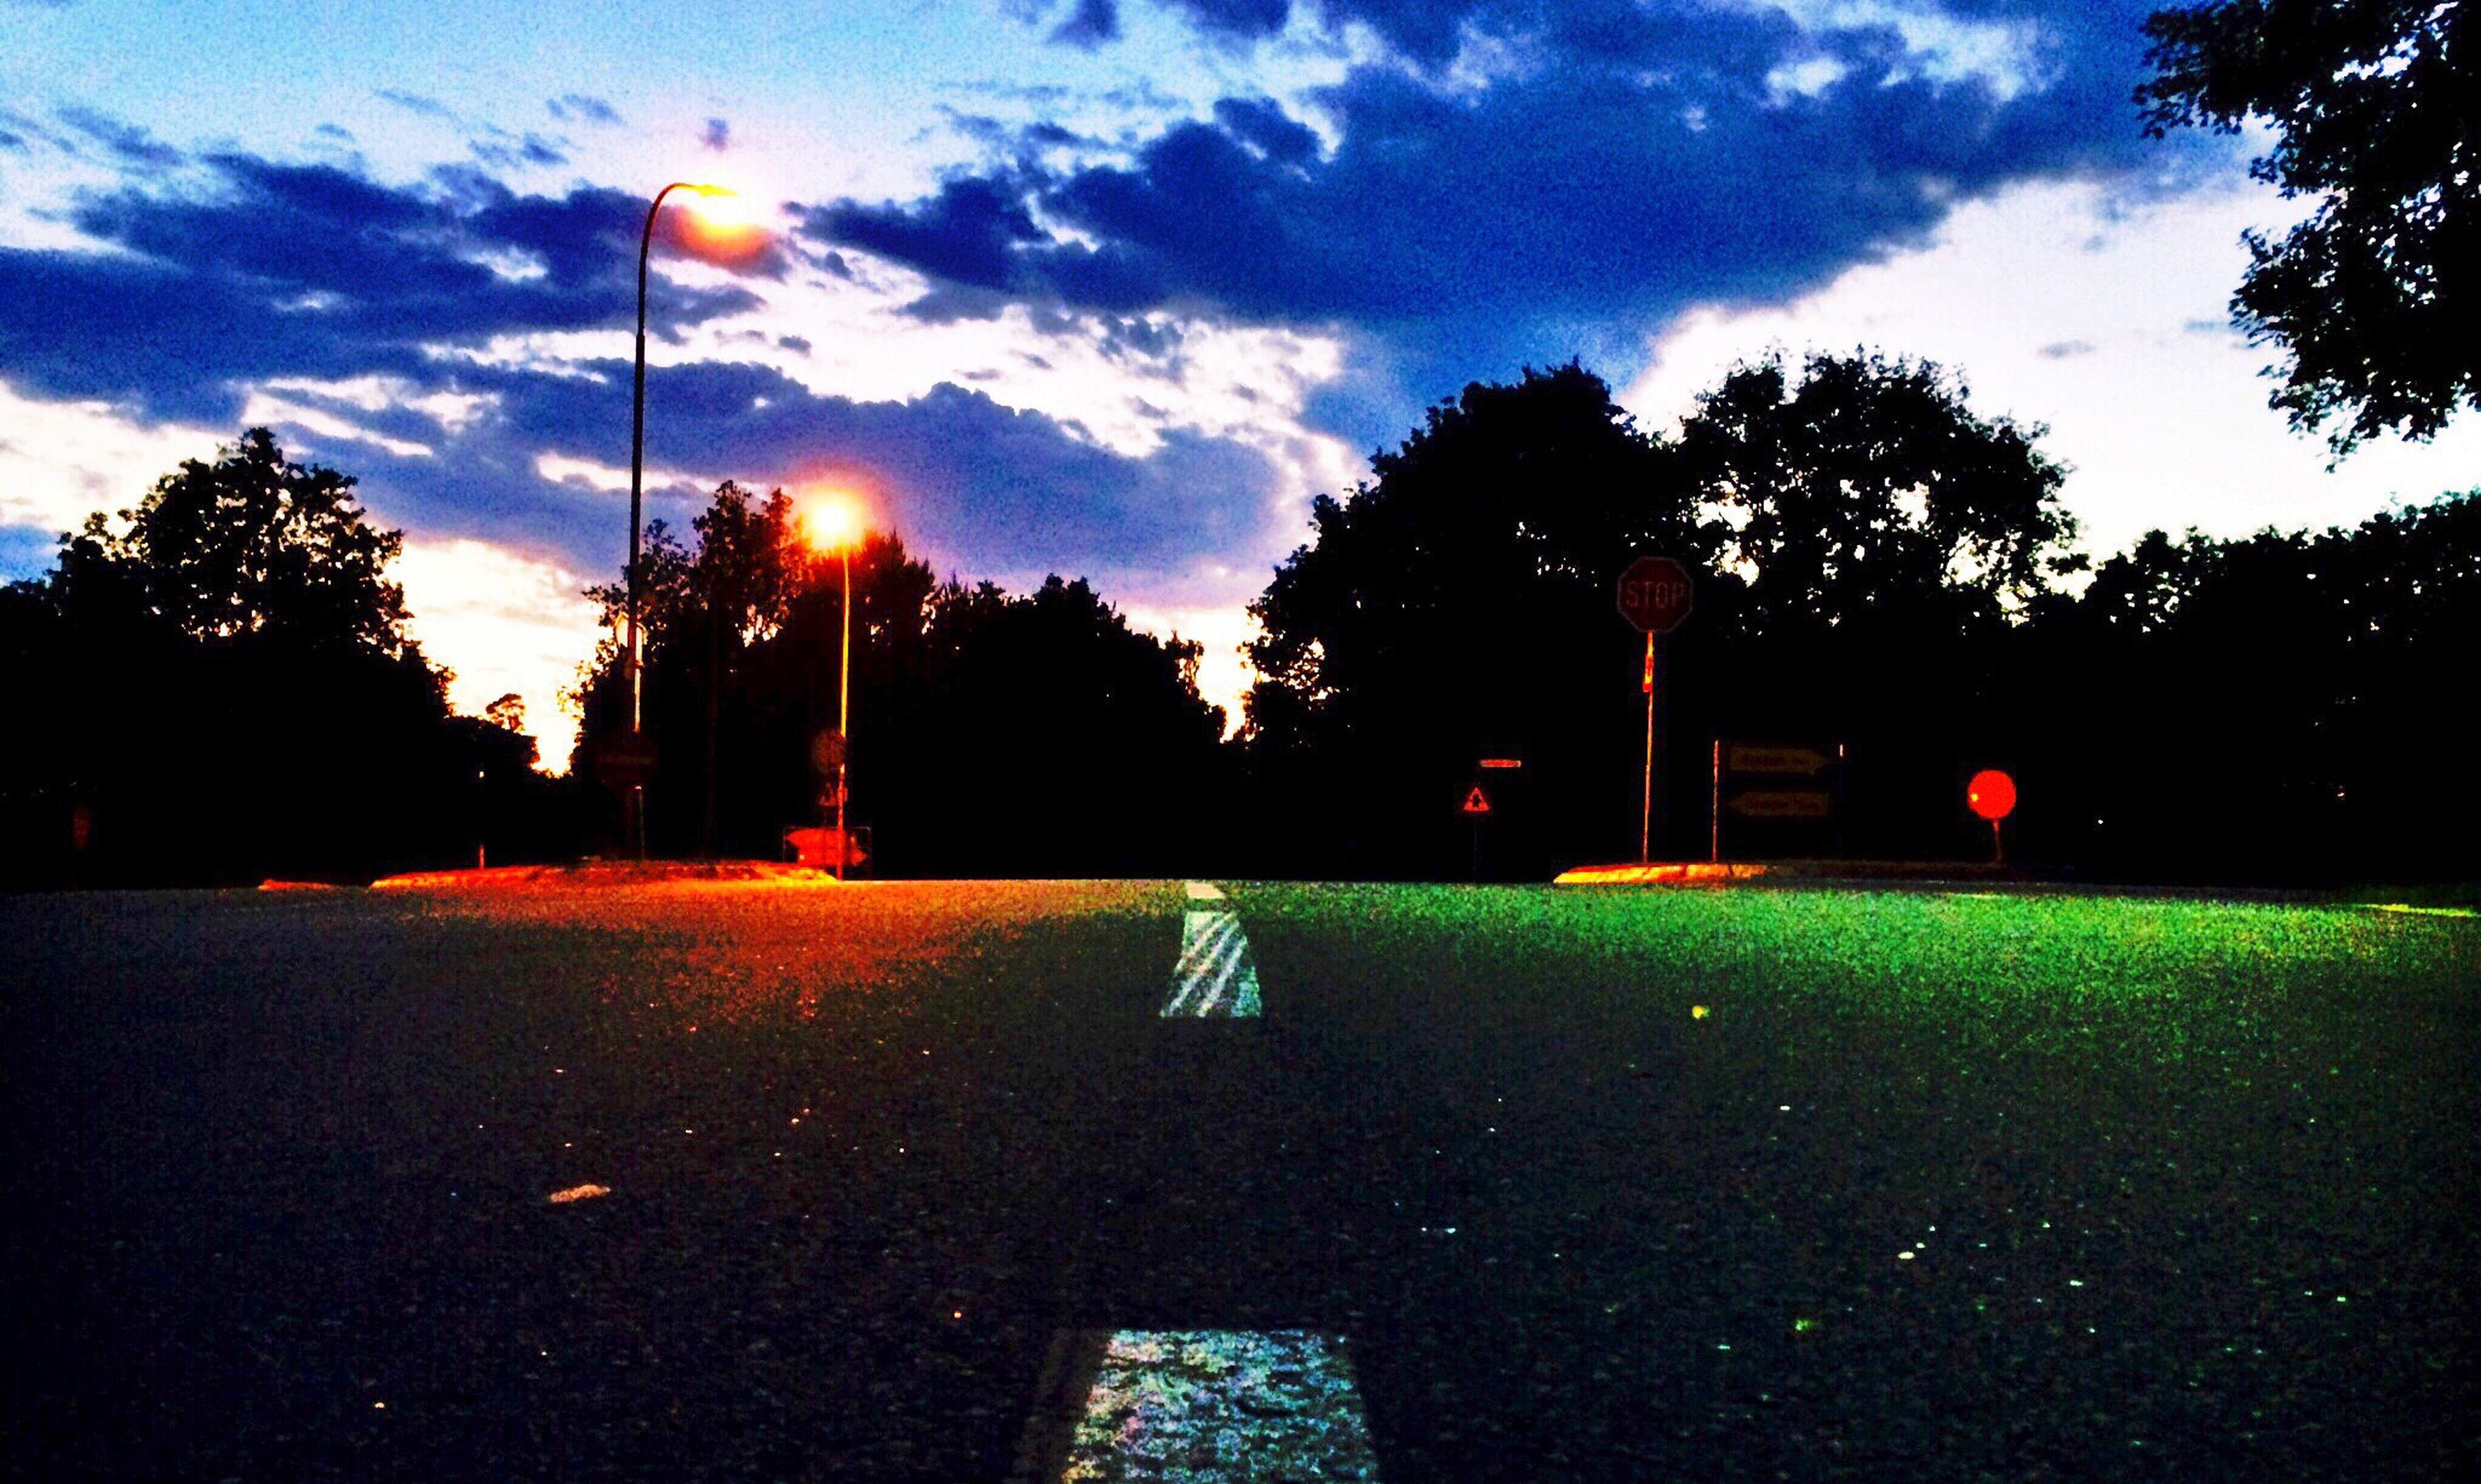 tree, sky, street light, silhouette, sunset, transportation, road, cloud - sky, street, dusk, cloud, lighting equipment, tranquility, empty, nature, illuminated, sunlight, the way forward, outdoors, car